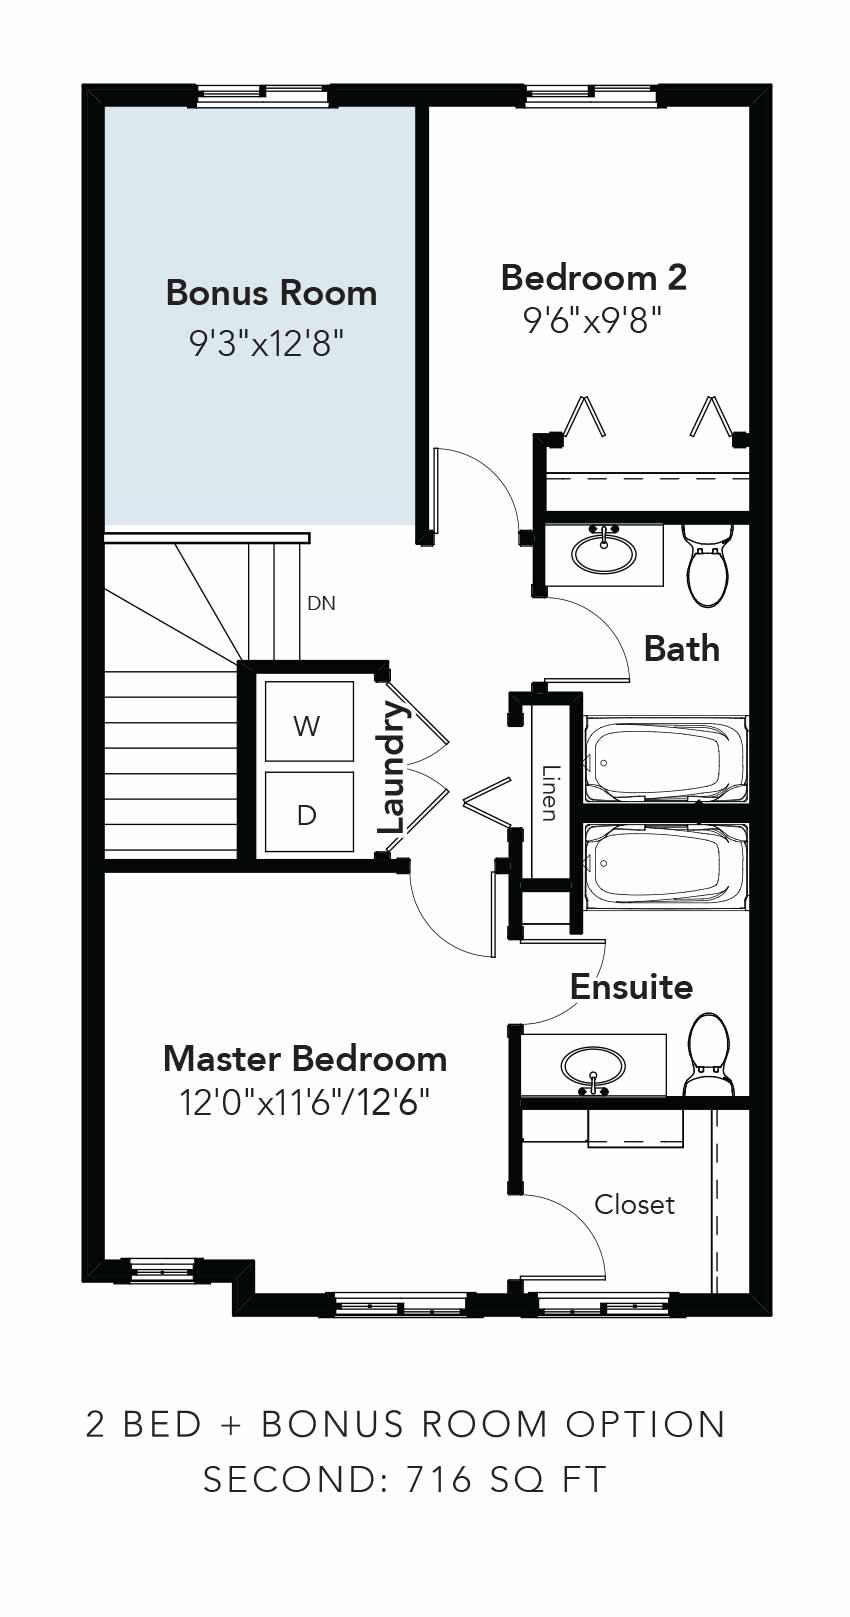 Niagara 2 Bed + Bonus Room